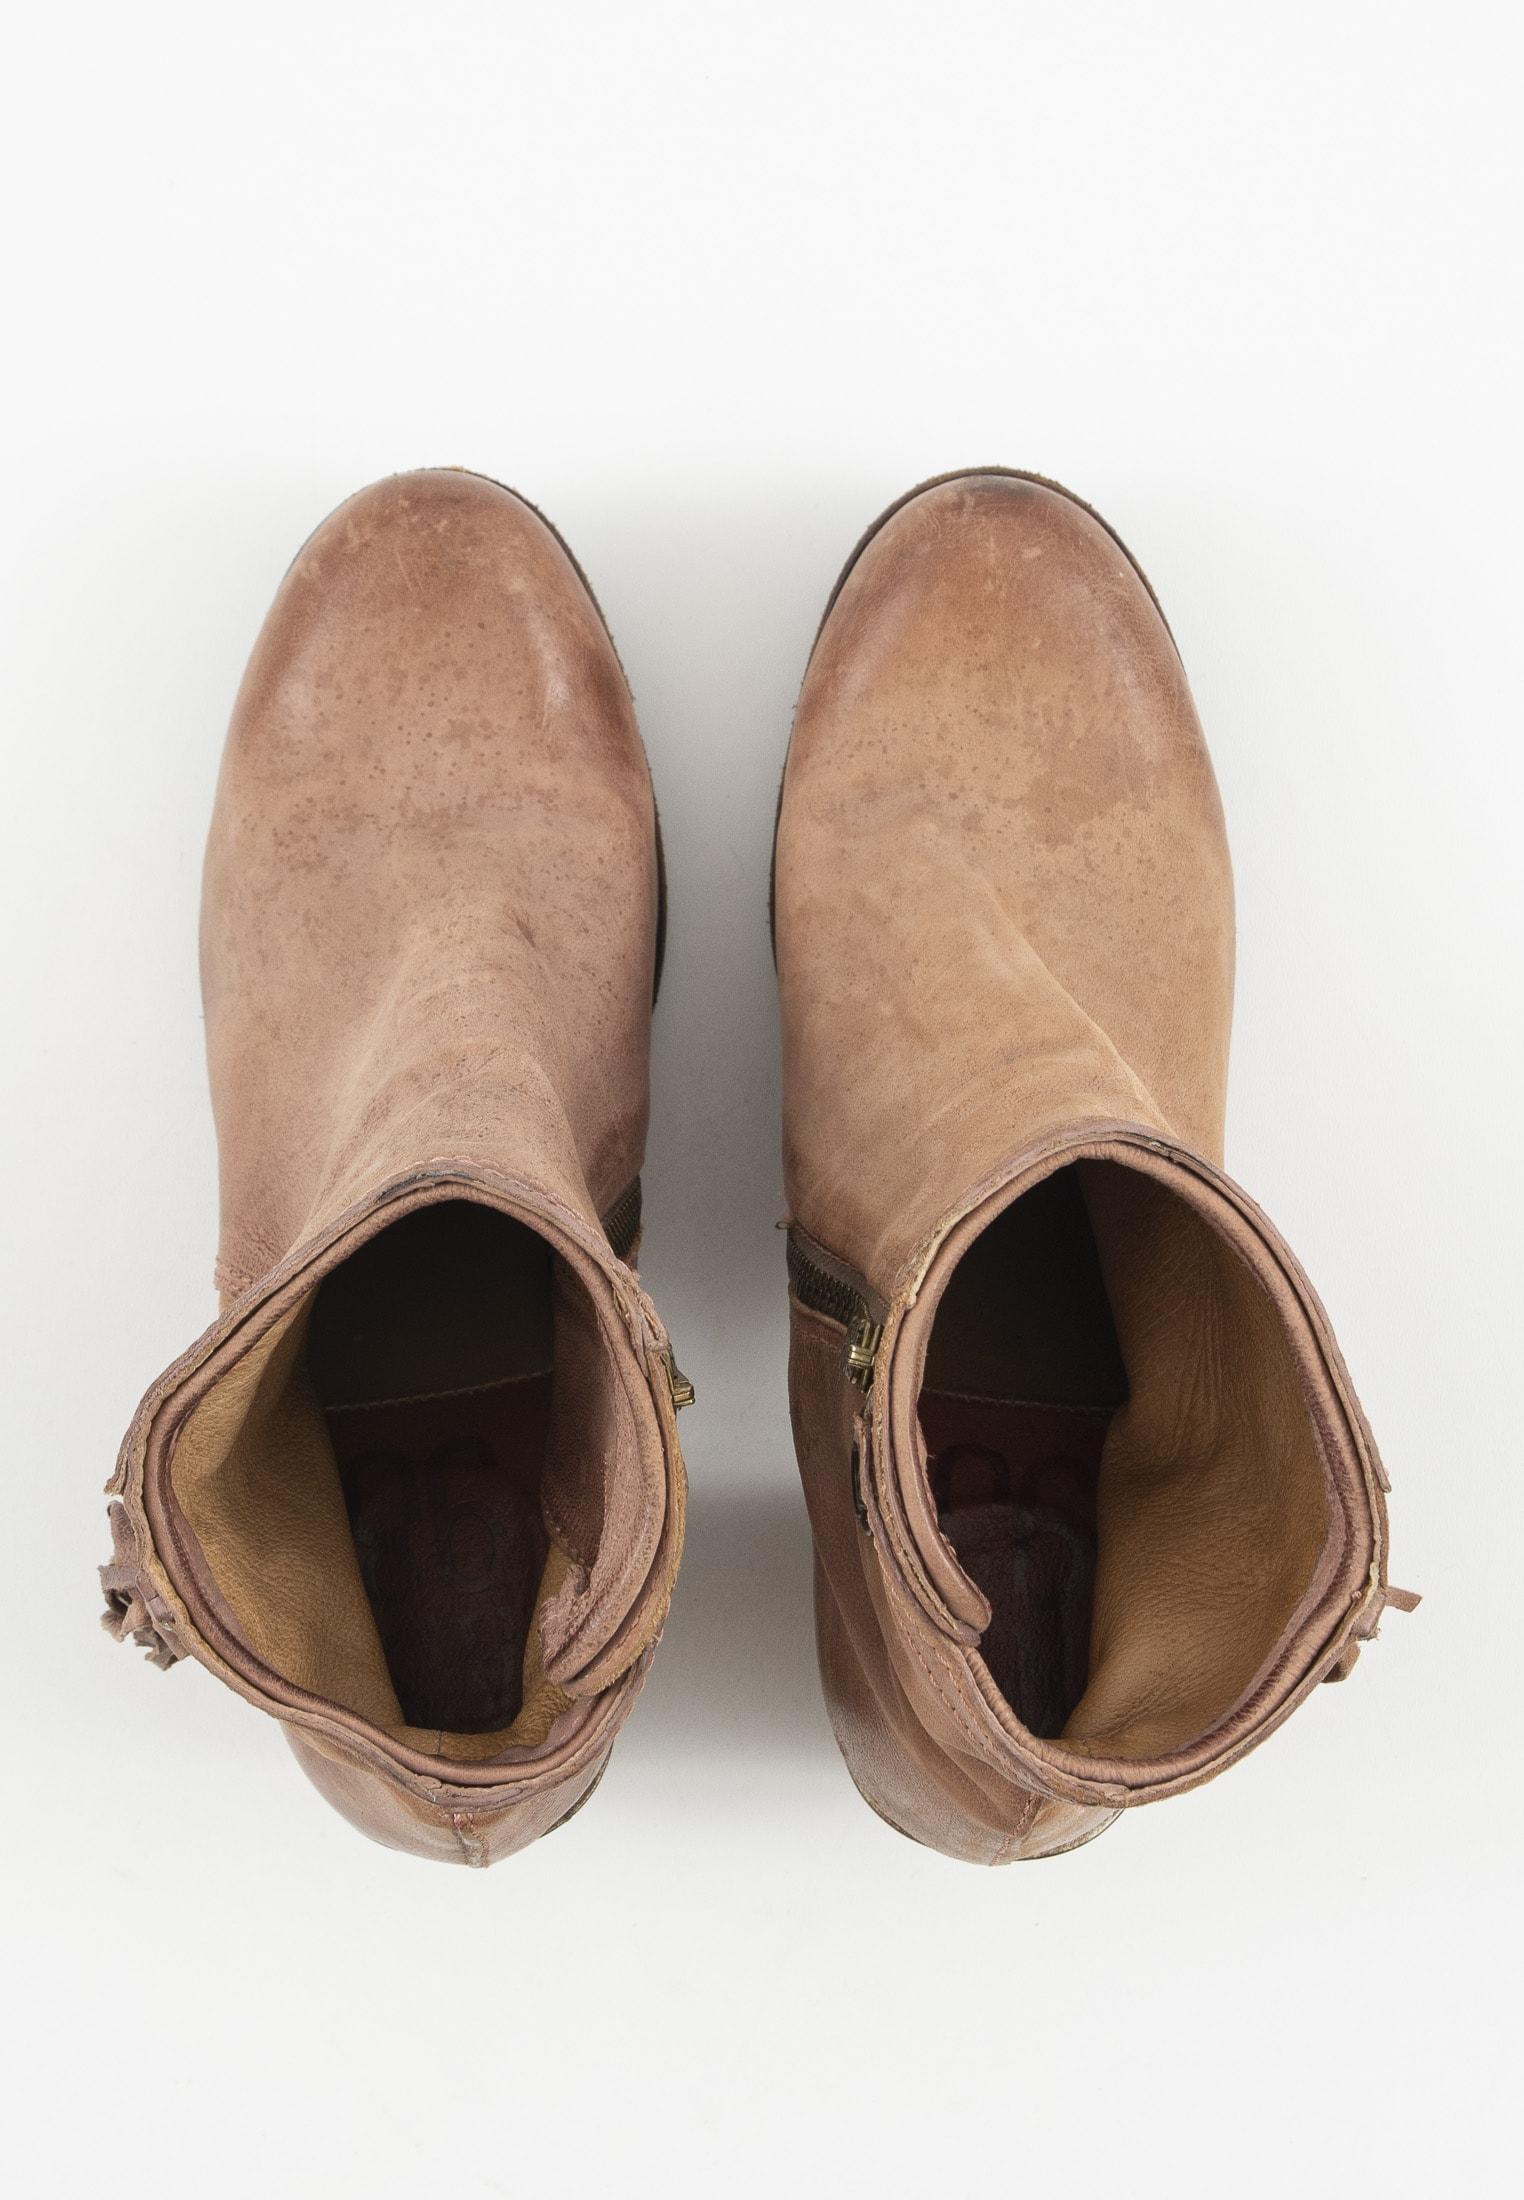 A.S.98 Stiefel / Stiefelette / Boots Braun Gr.39